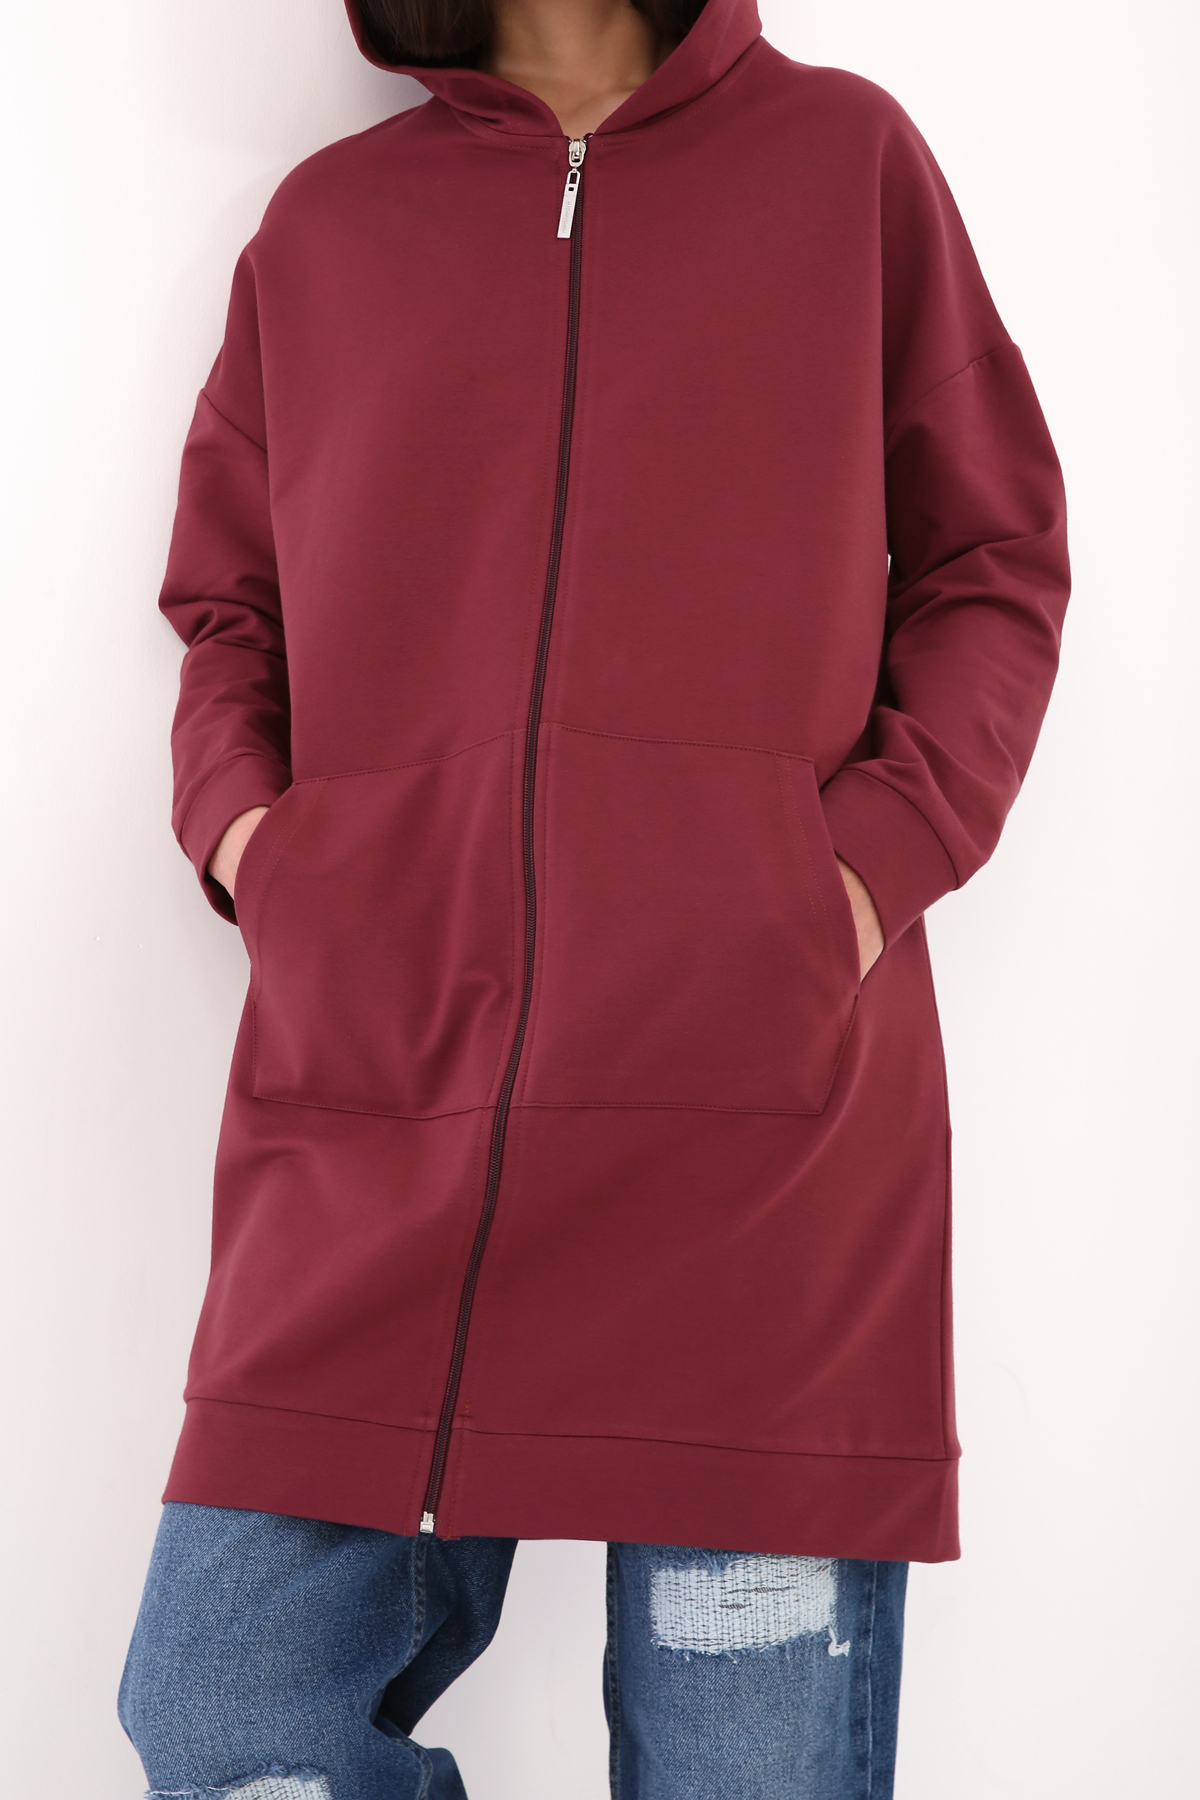 Hooded Zippered Long Cardigan